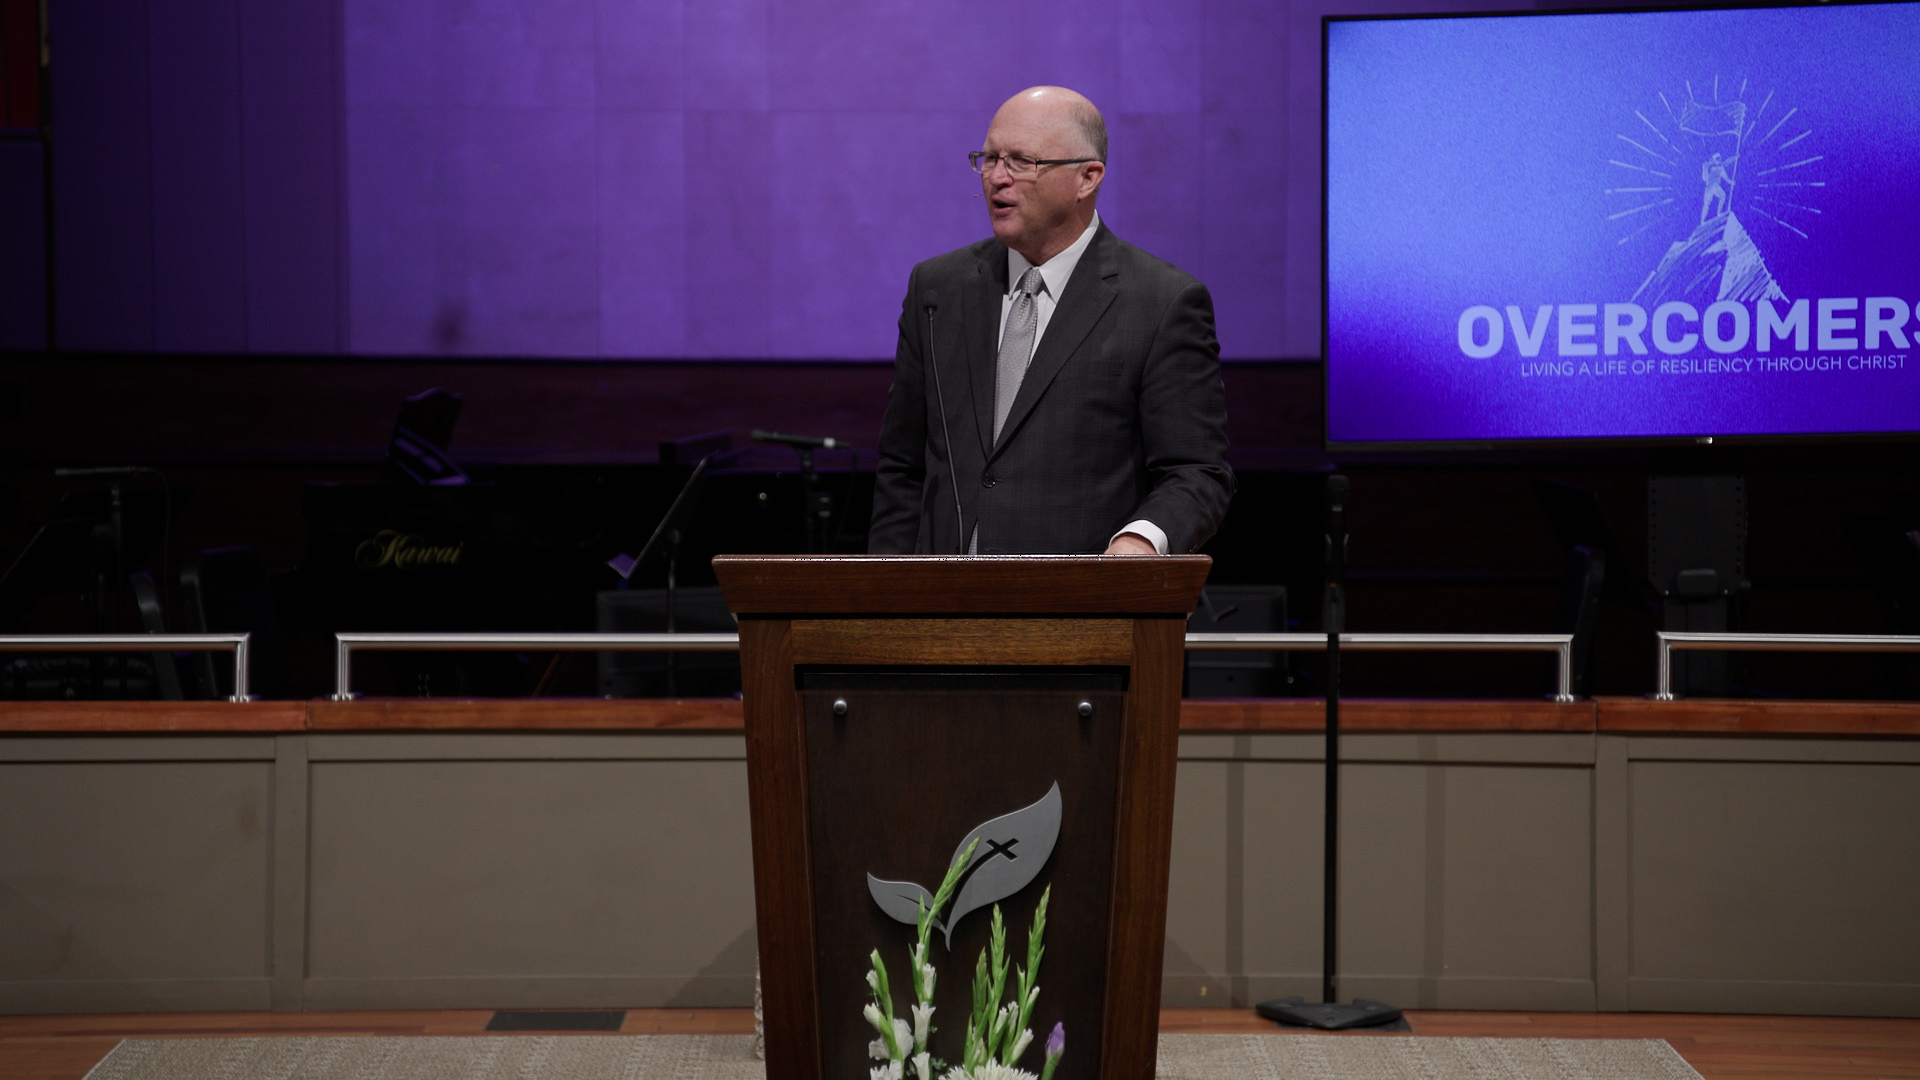 Pastor Paul Chappell: Overcomers